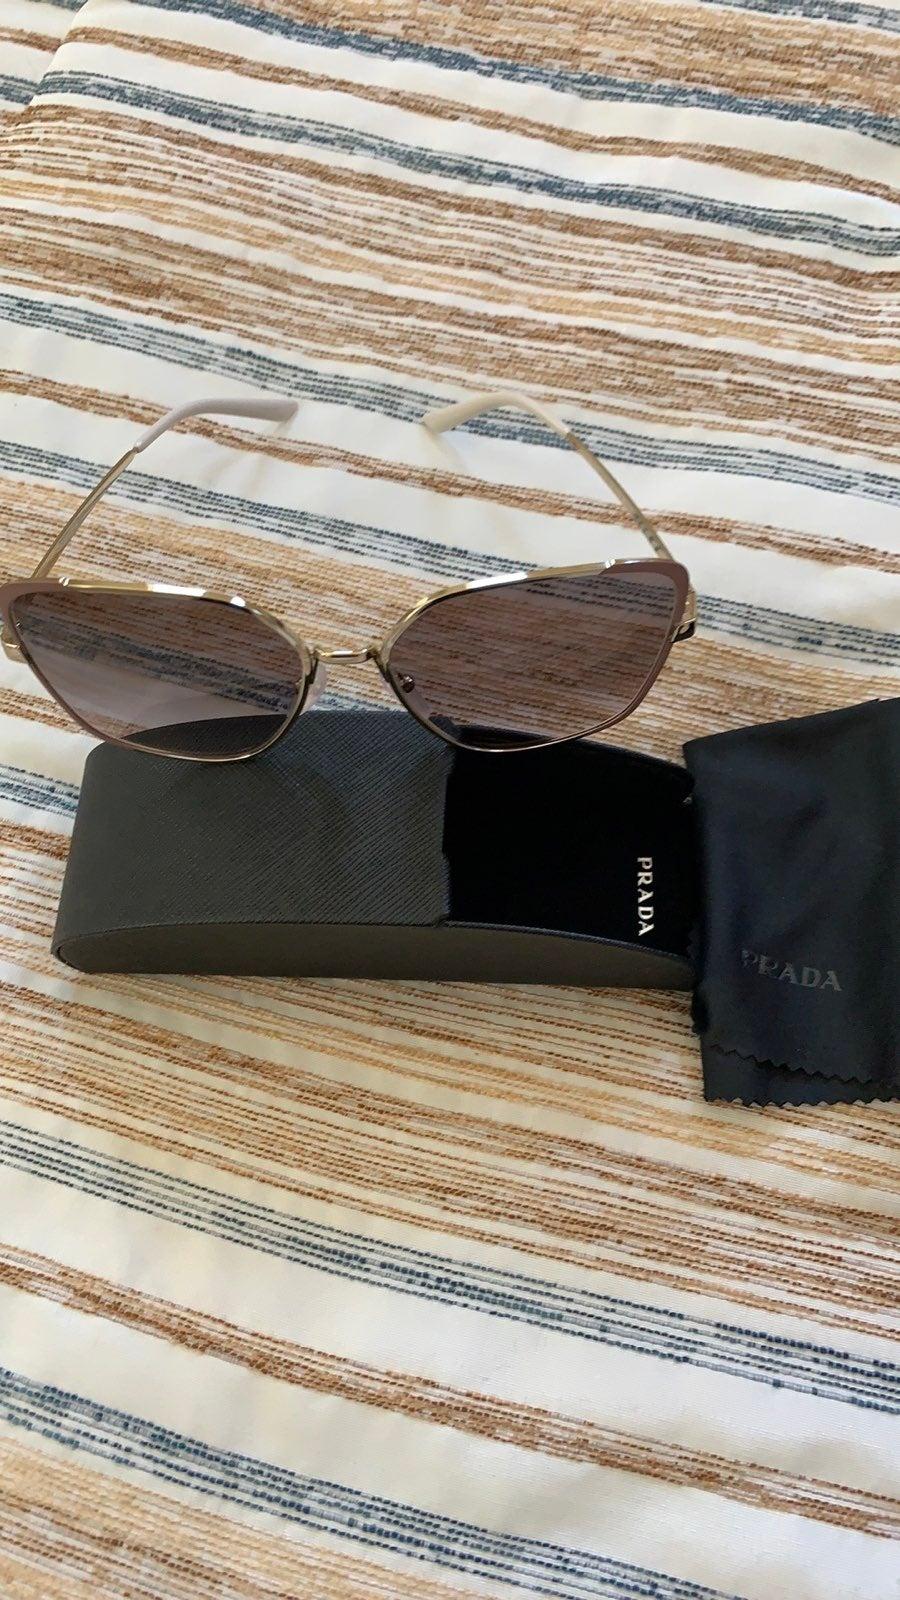 Woman's Prada Sunglasses